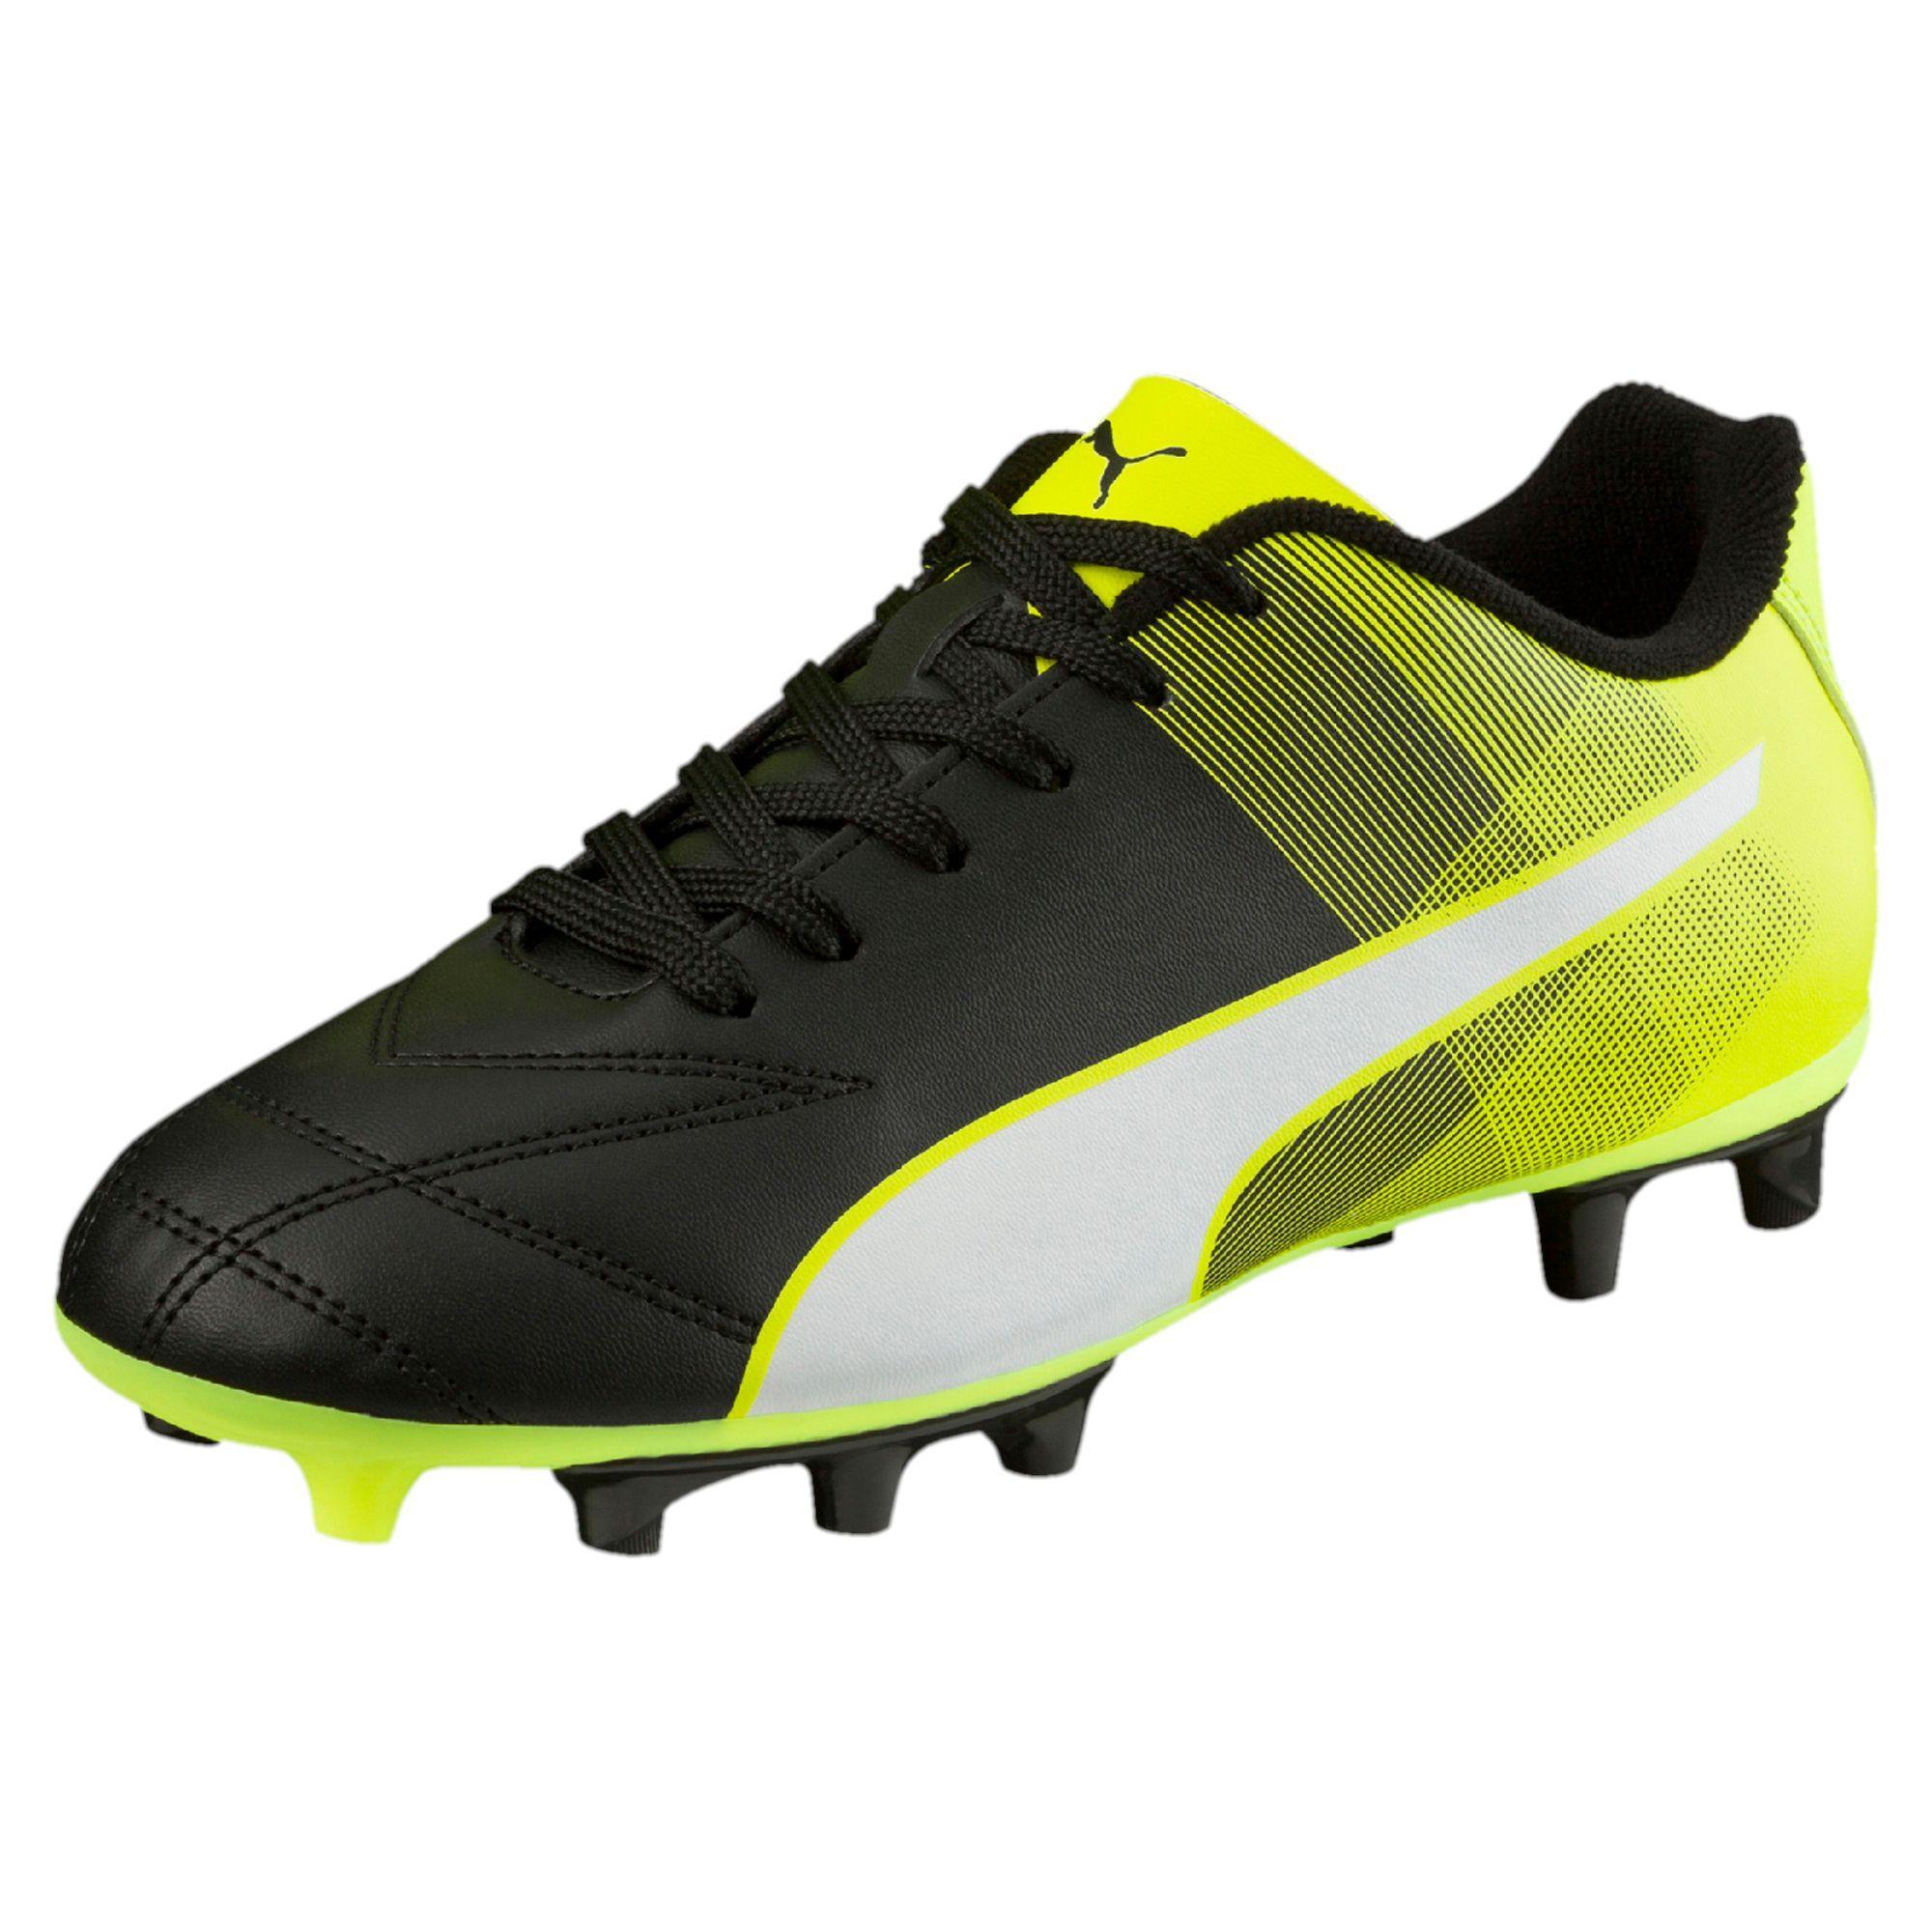 on sale 98623 566ca  Puma  Futbol  Cleats